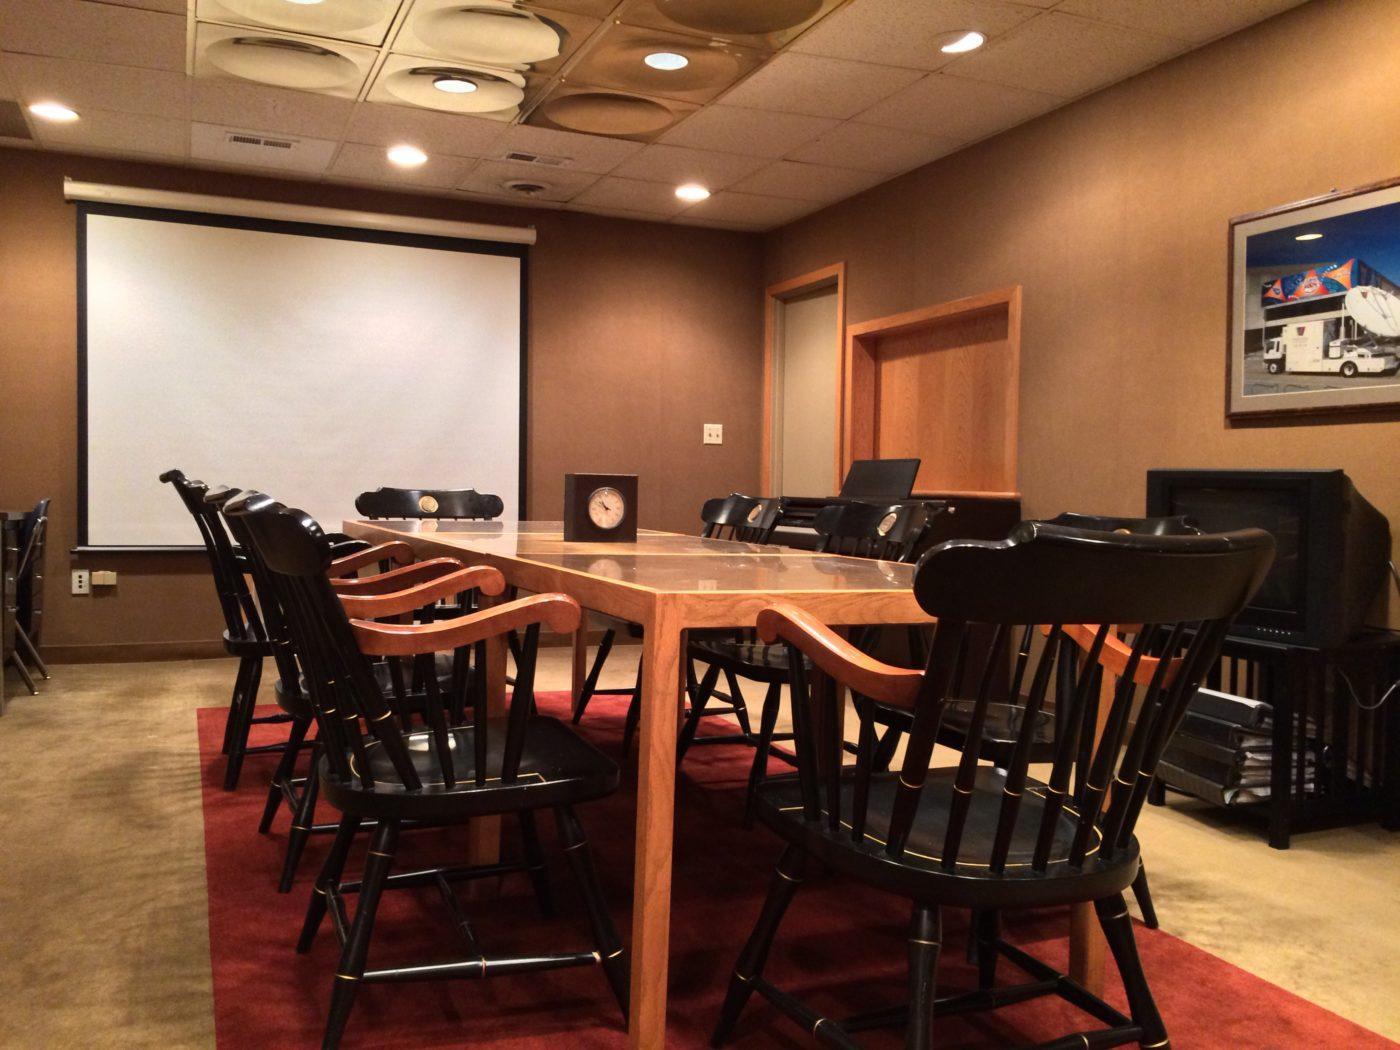 The Studio Dedham Television And Media Engagement Center